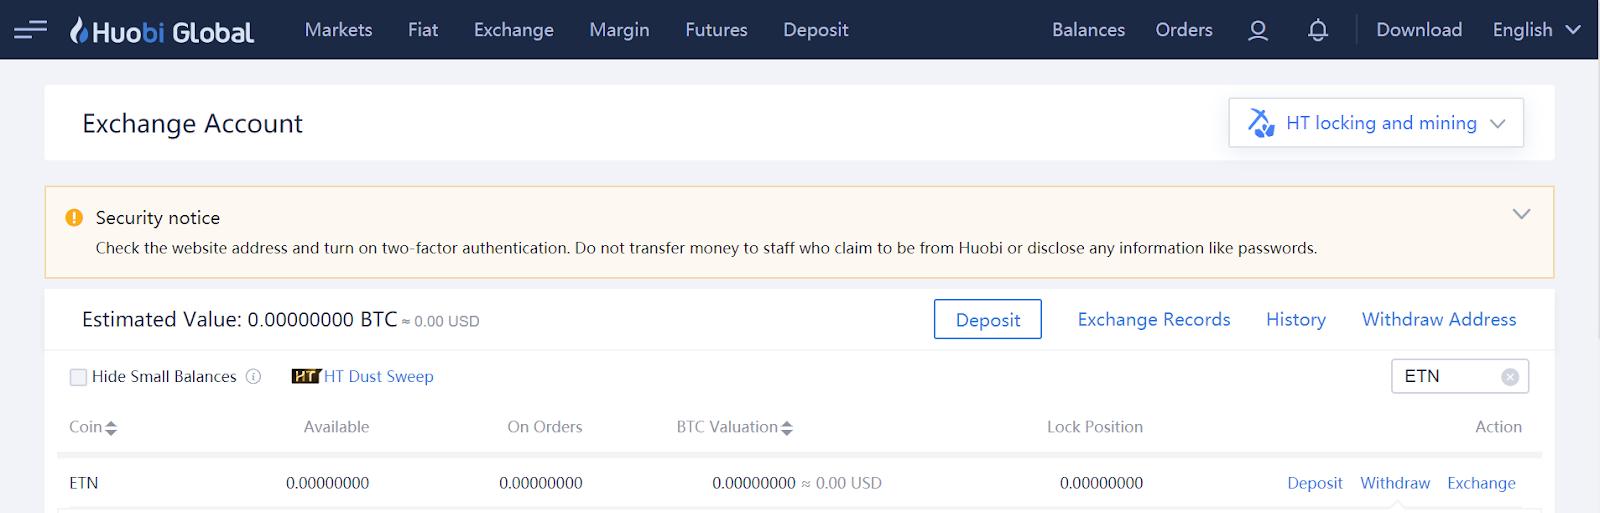 How to Deposit ETN toBiKi